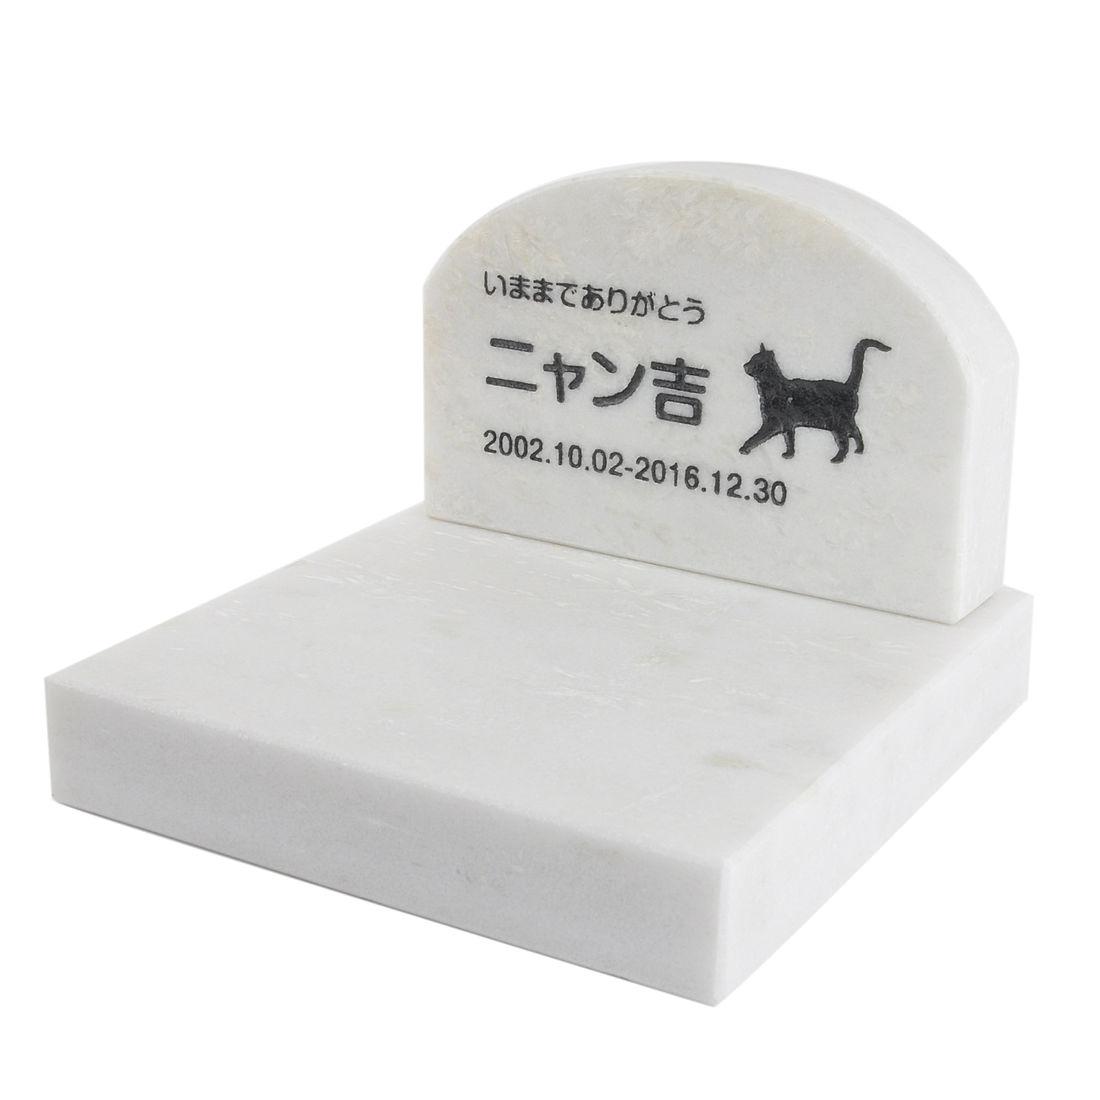 Pet&Love. ペットのお墓 天然石製 セット型 底板が厚く重いタイプ 大理石 ホワイト アーチ  【HLS_DU】【楽ギフ_名入れ】 attr177attr ctgr2ctgr sml3sml+ctgr2ctgr CAT